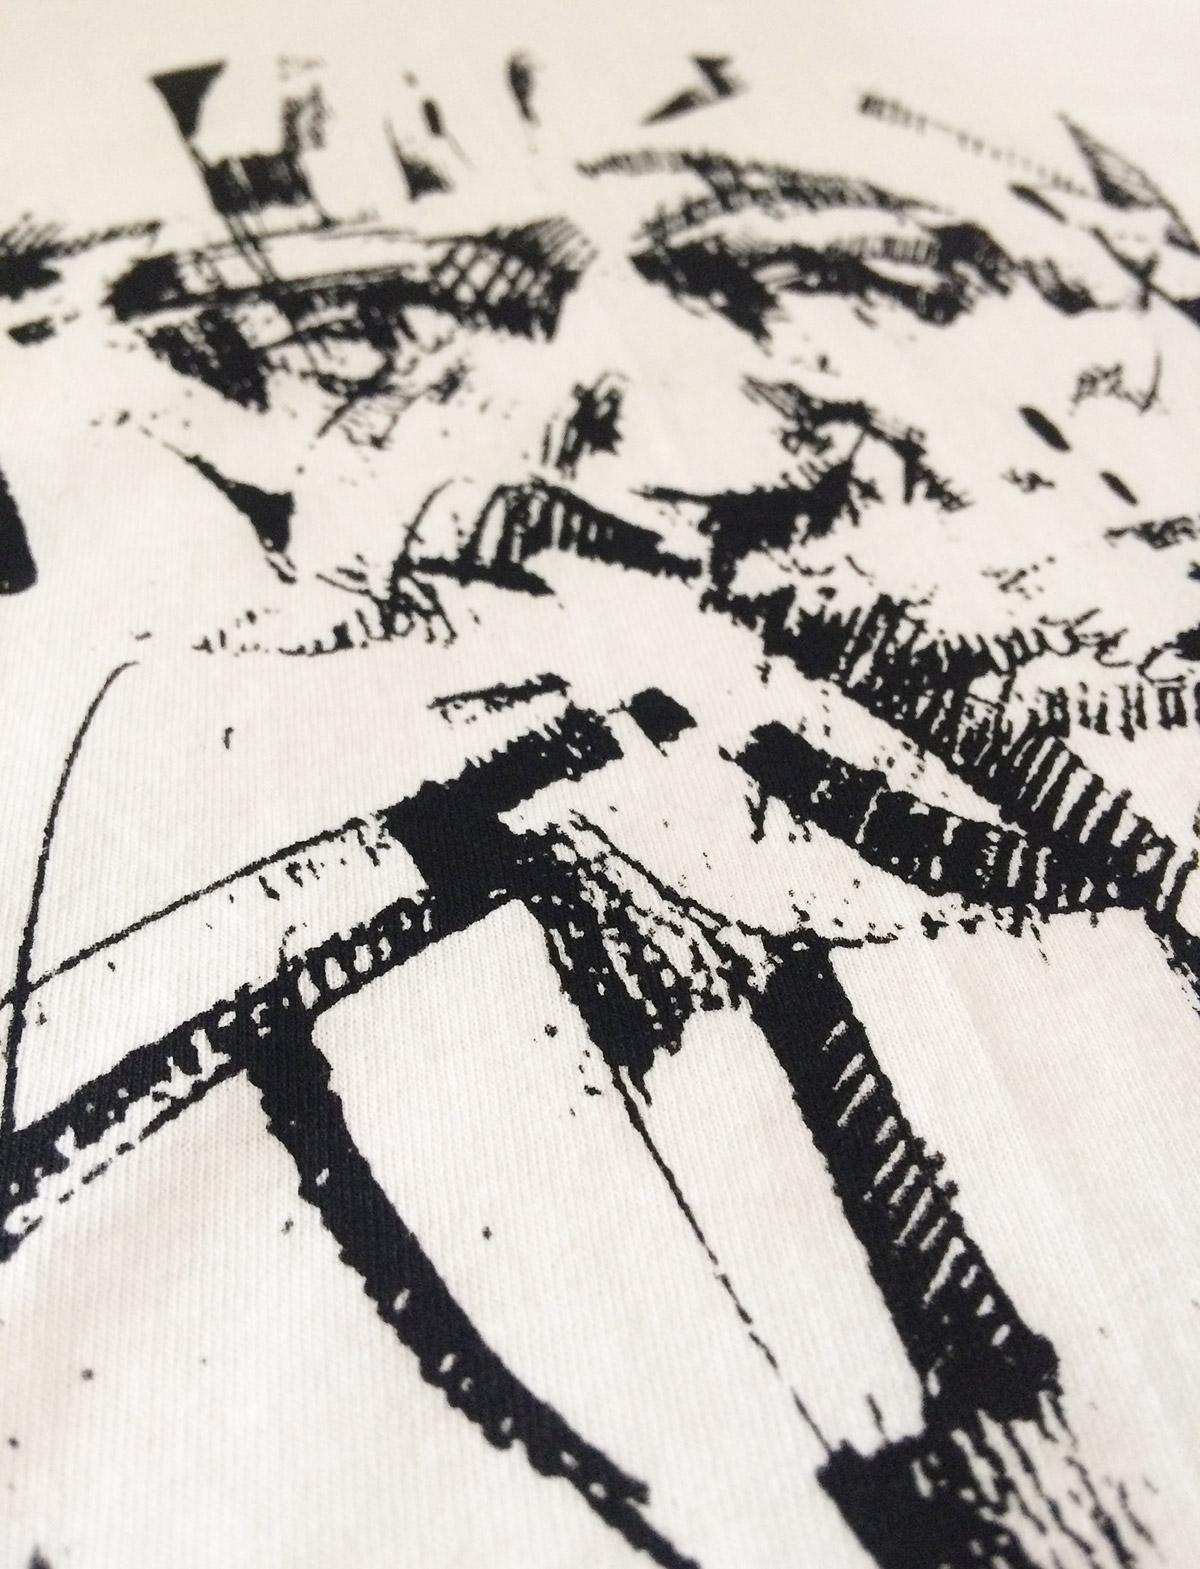 Pencil games 3 by. Artwork Asterios Laskaris